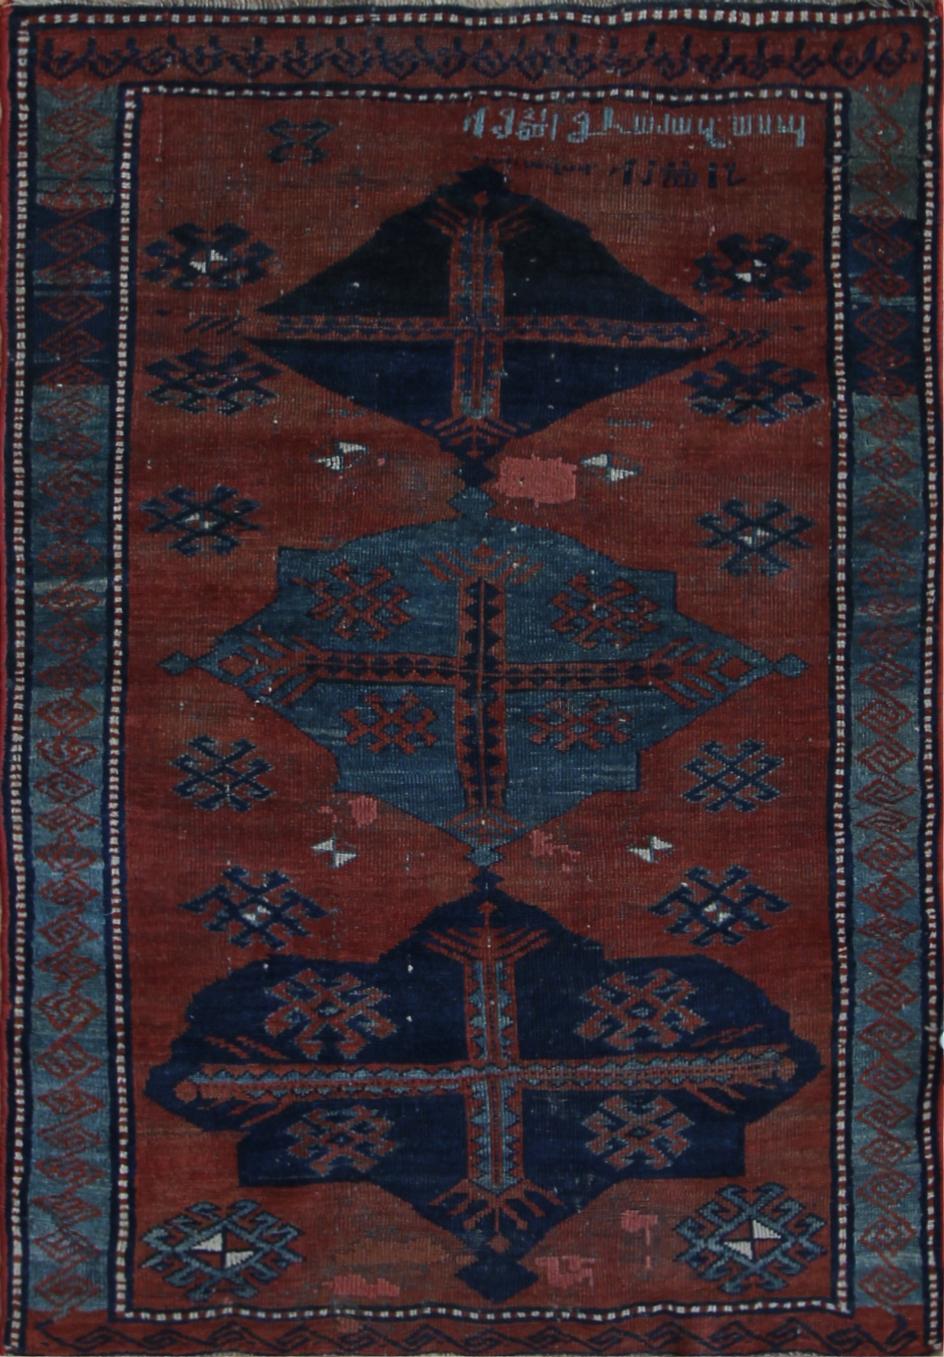 230 Armenian Village Rug, Dated 1919, Inscribed Hamazasp, 4' x 5'9''